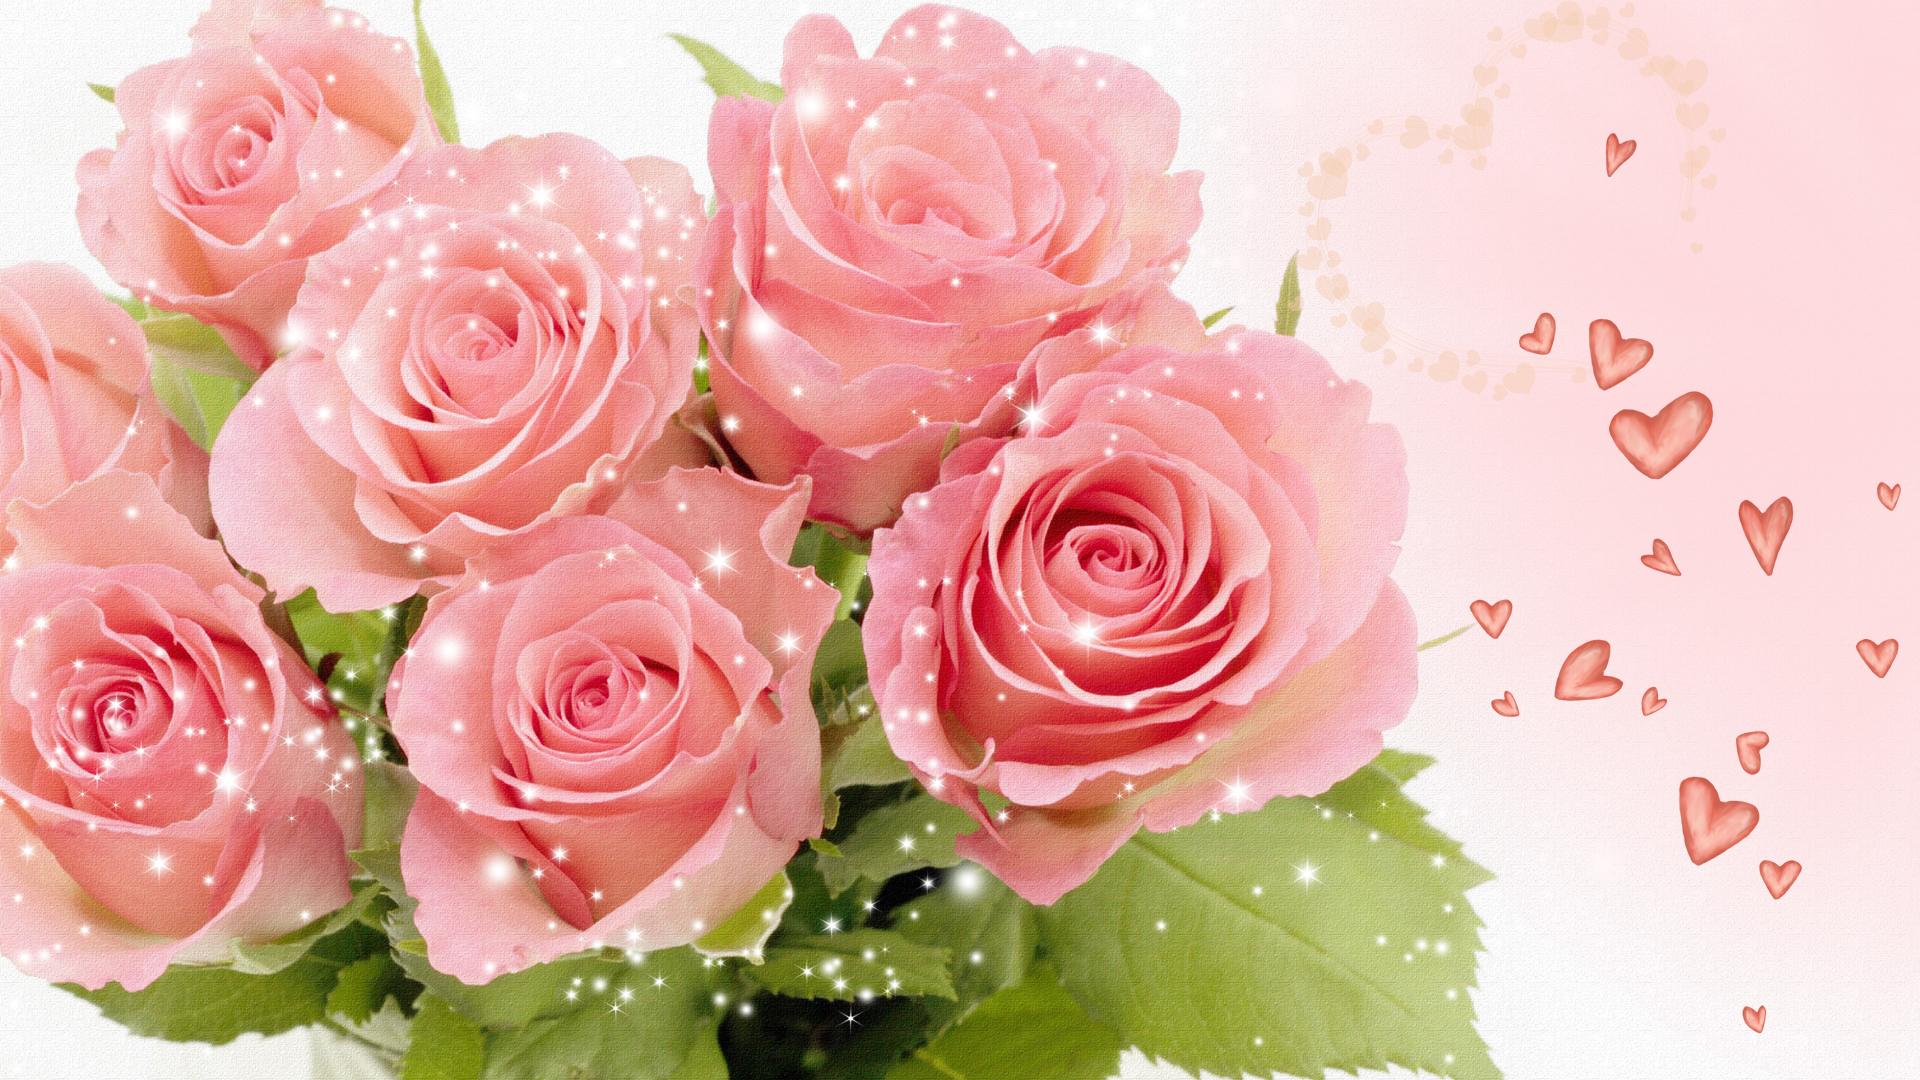 Pretty Pink Rose Wallpaper   Colors Wallpaper 34511804 1920x1080